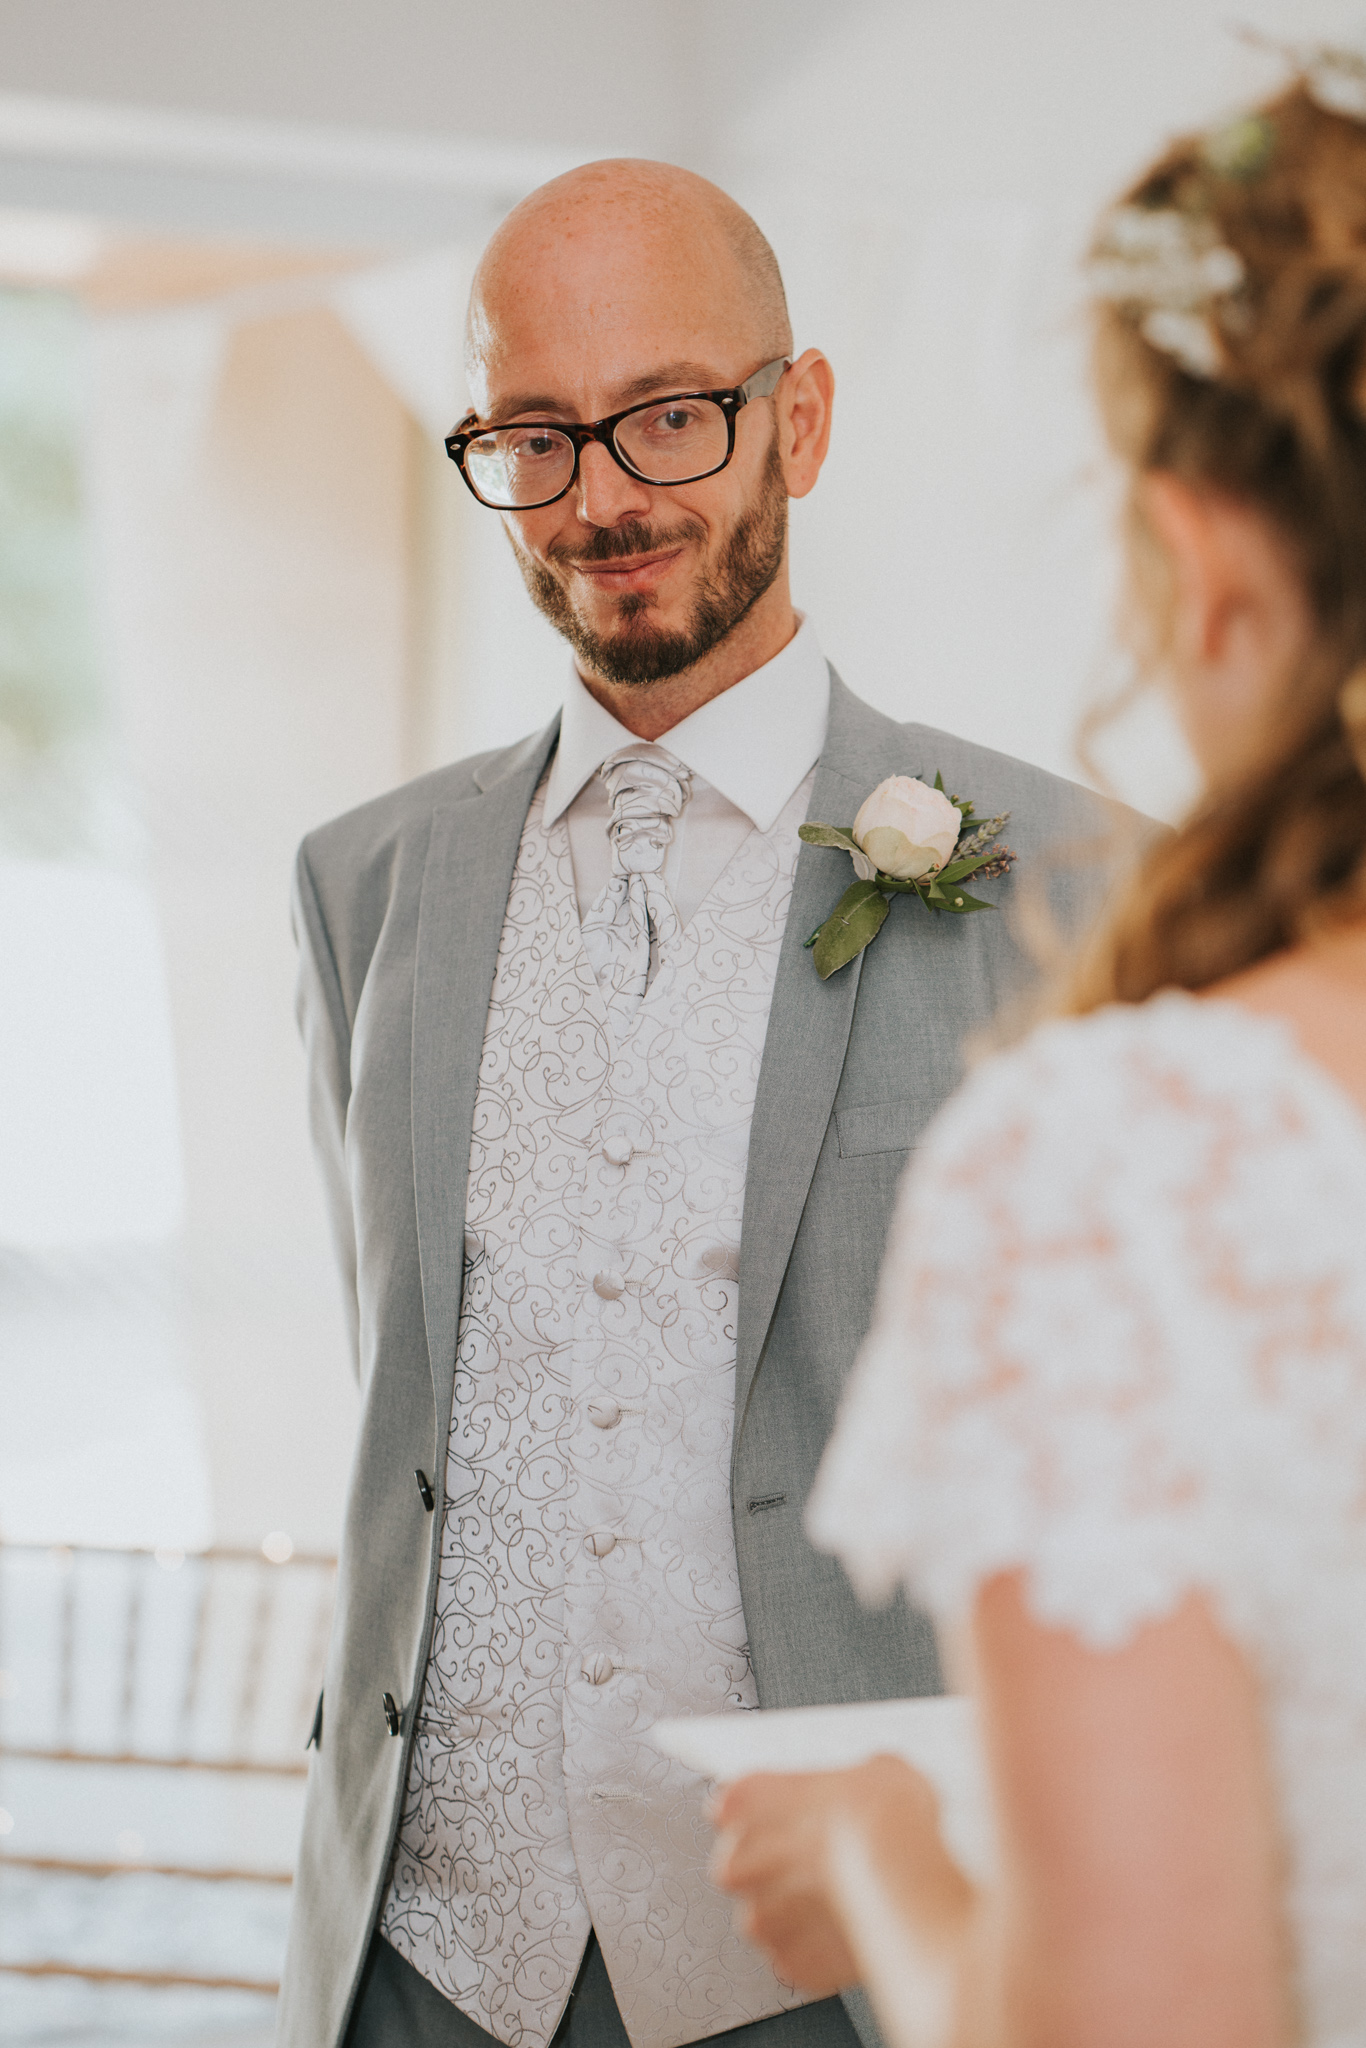 Grace-Elizabeth-Georgie-Amalaketu-Firstsite-Colchester-Essex-Boho-Buddhist-Wedding-Alternative-Wedding-Photography-Essex (57 of 100).jpg